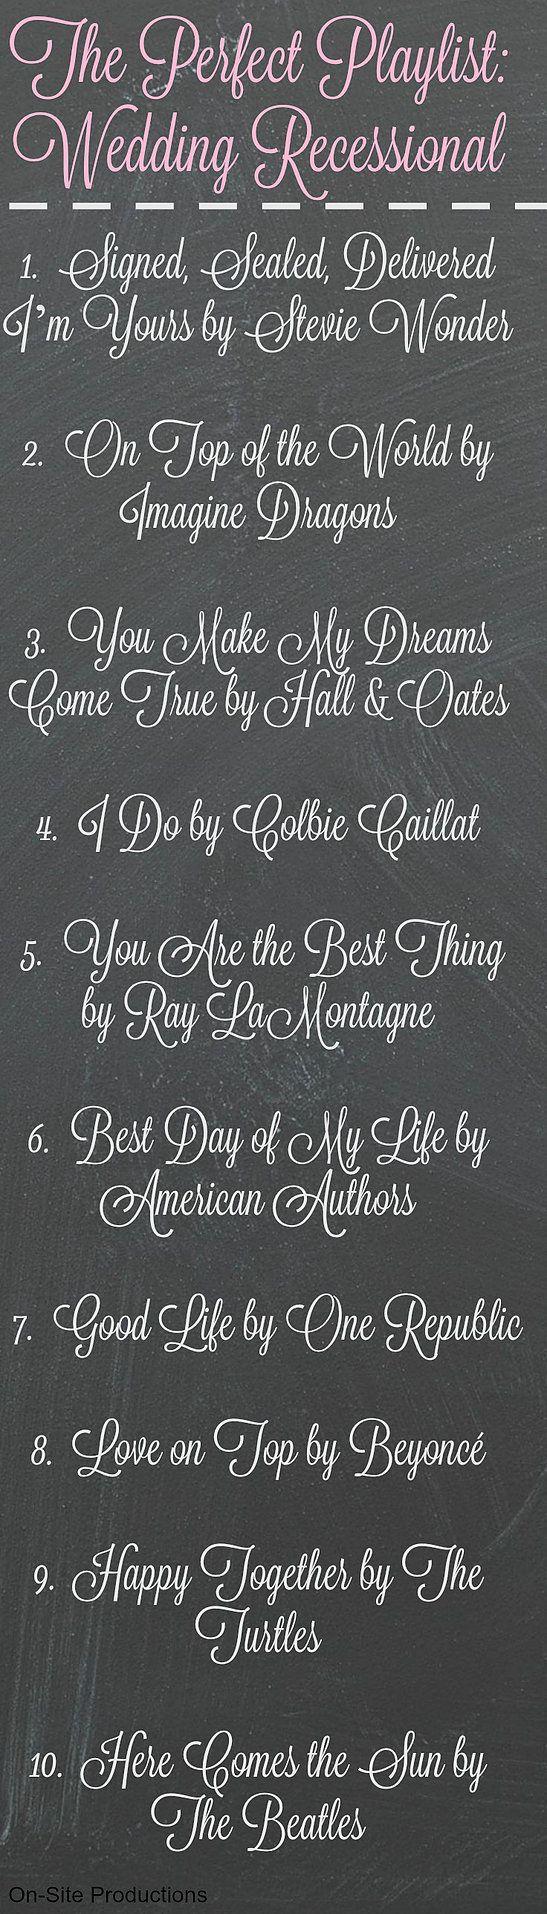 Ten Wedding Recessional Songs